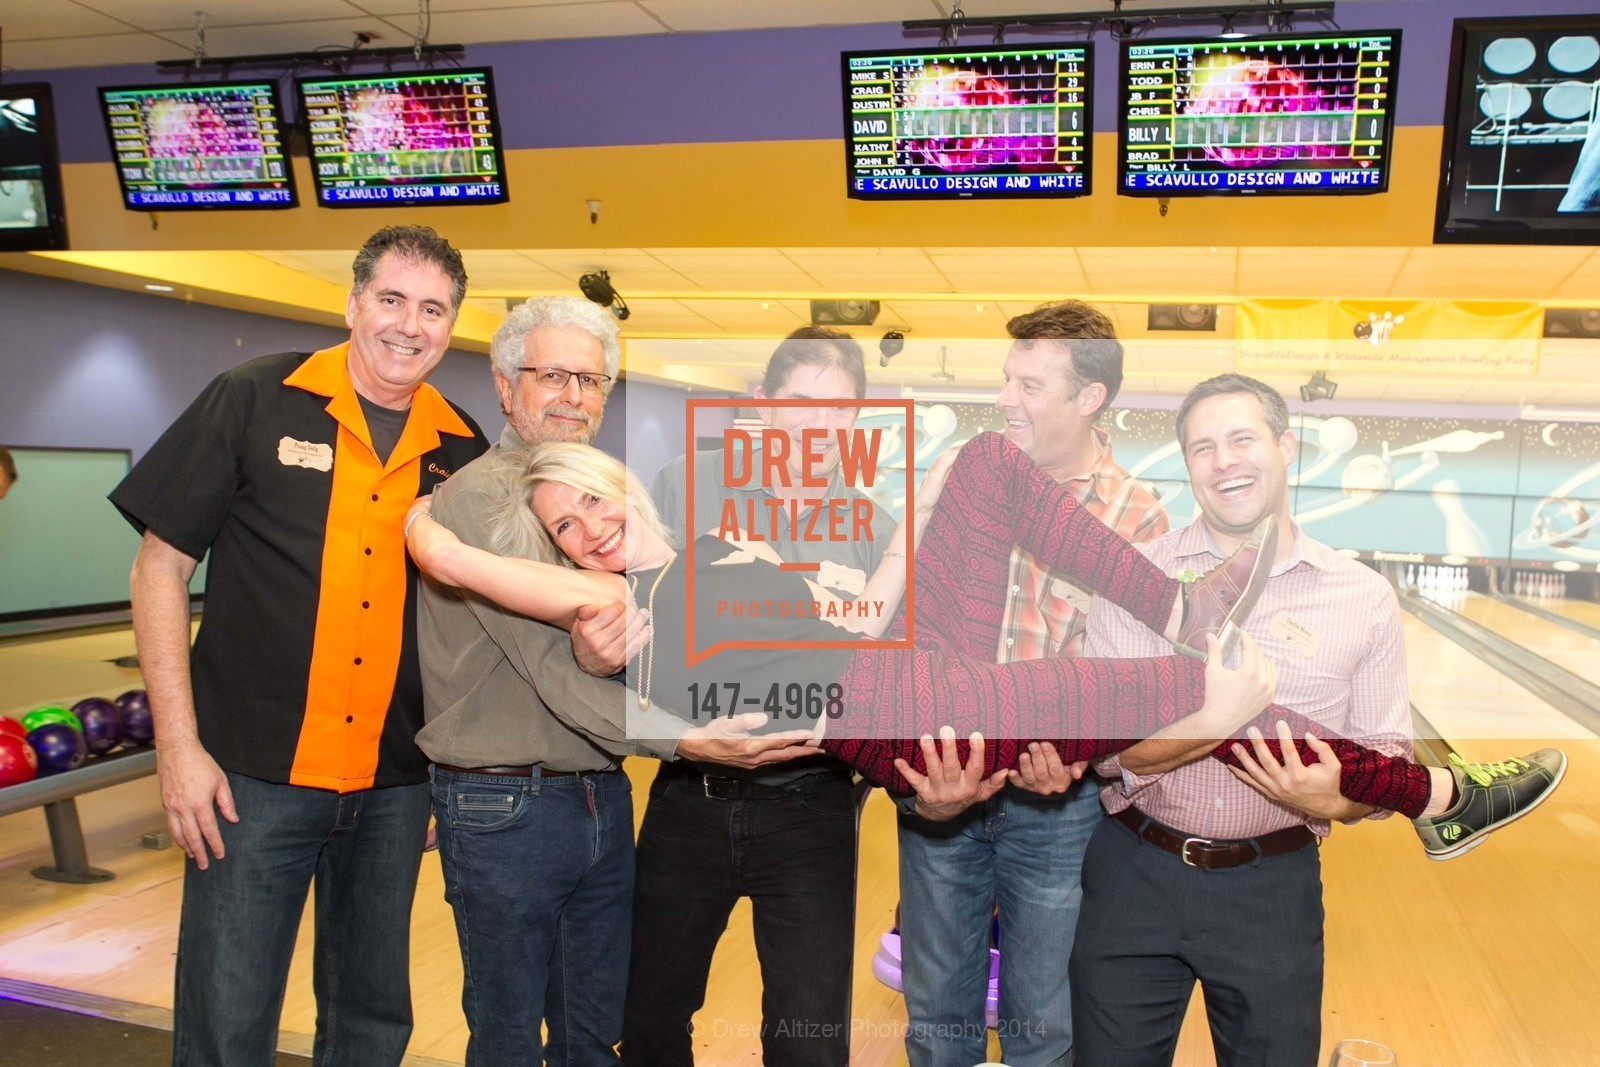 Craig Doty, David Gast, Kathy Best, John Rosekrans, Dustin Moore, Photo #147-4968